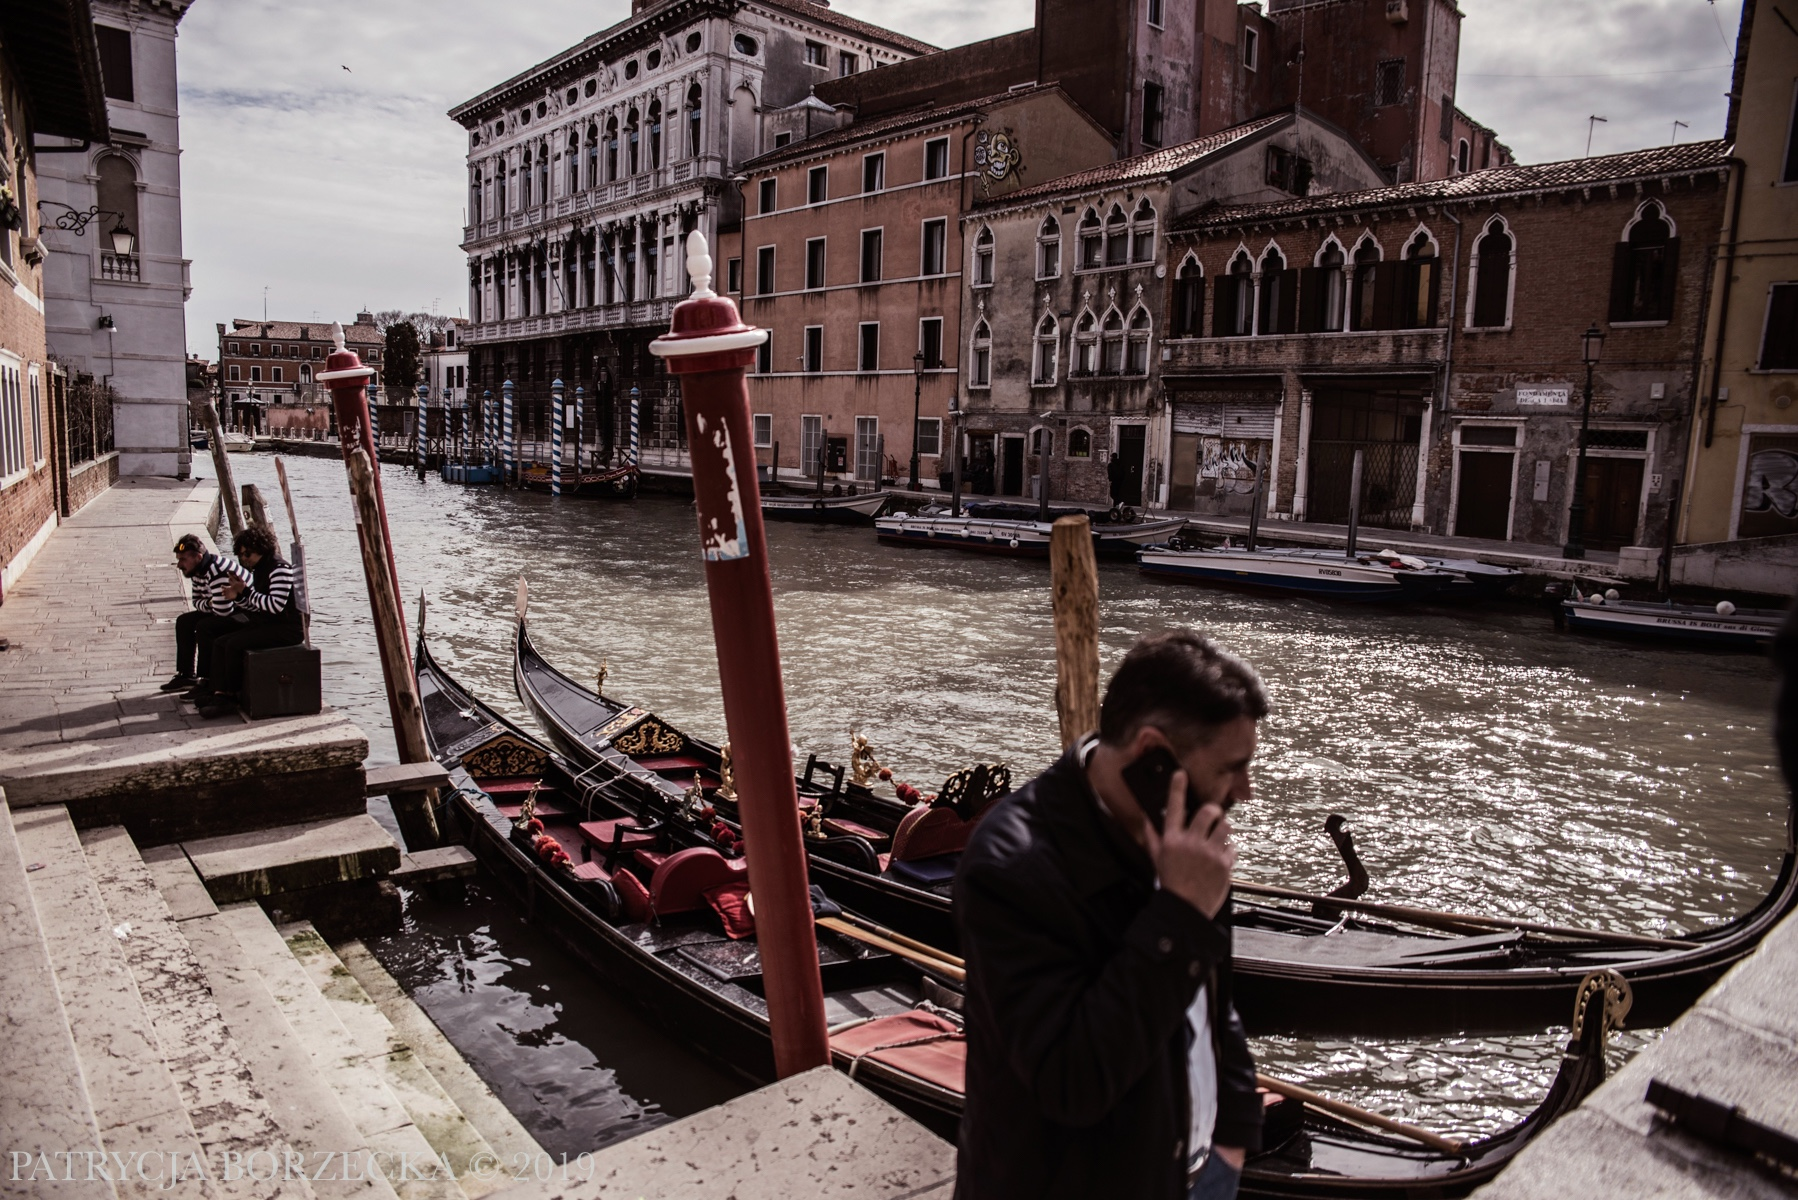 PatrycjaBorzecka-Photo-Venice-01